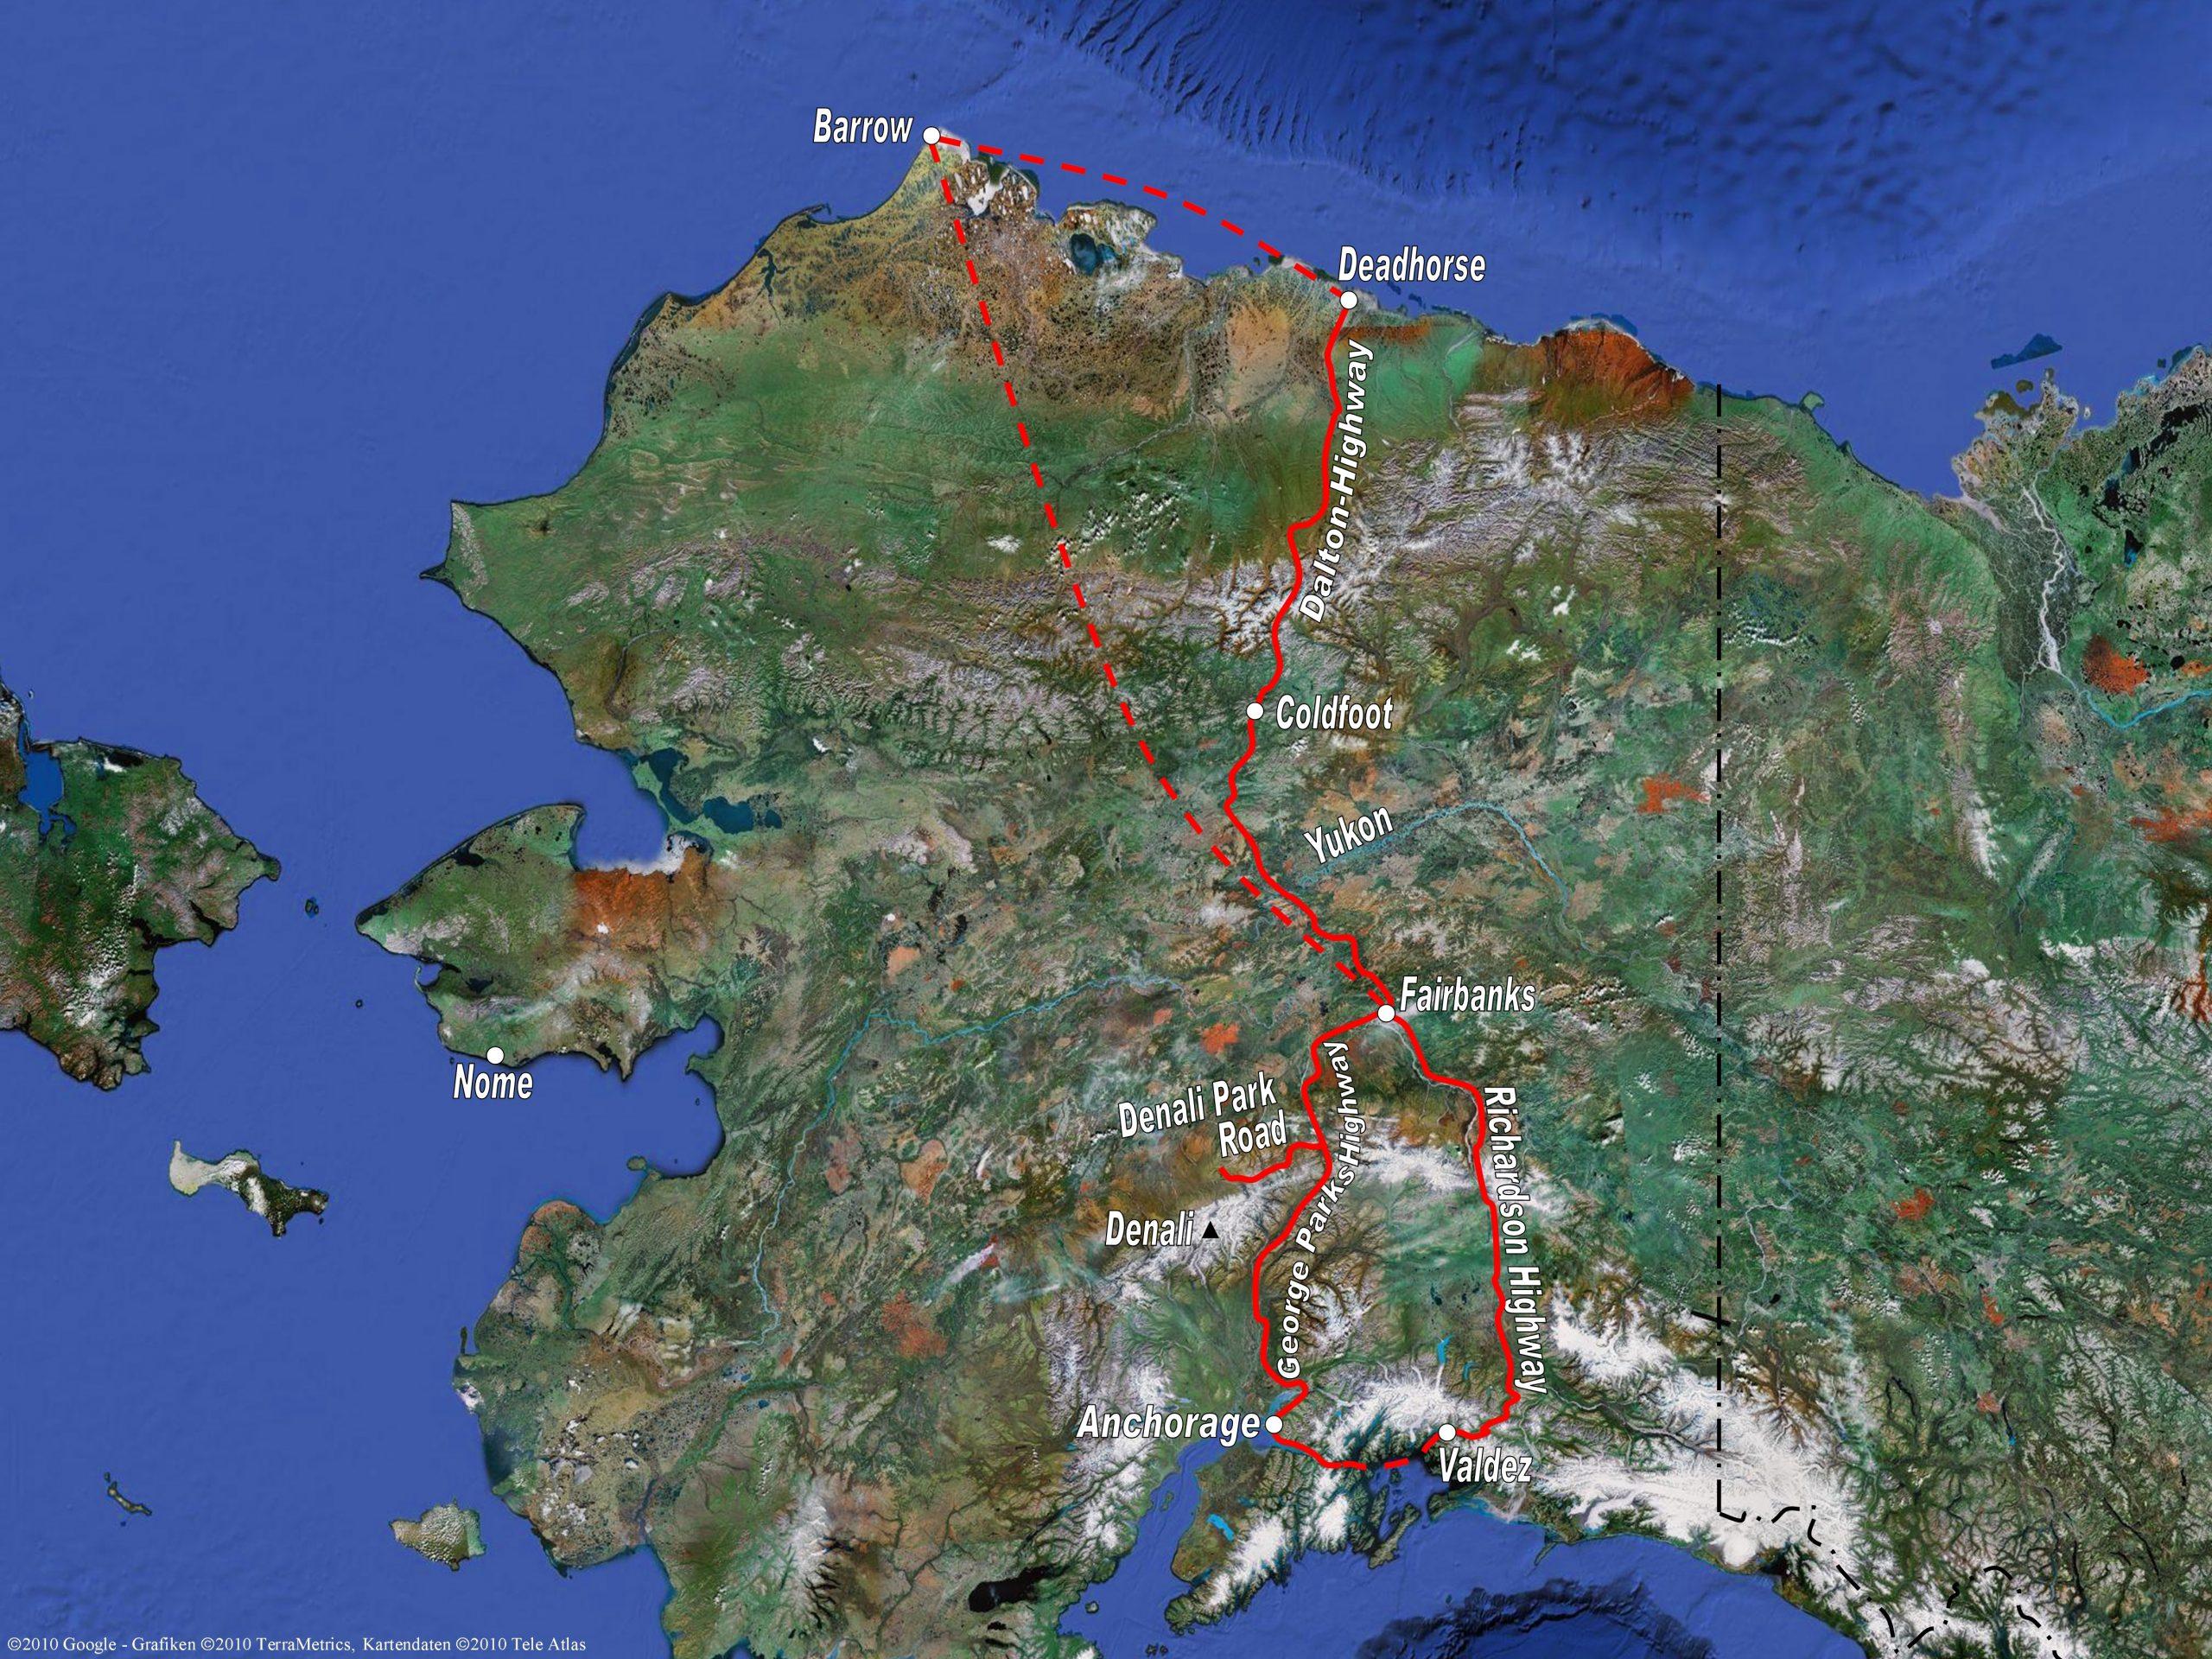 Radreise Alaska 2010 - Karte Zentral-Alaska